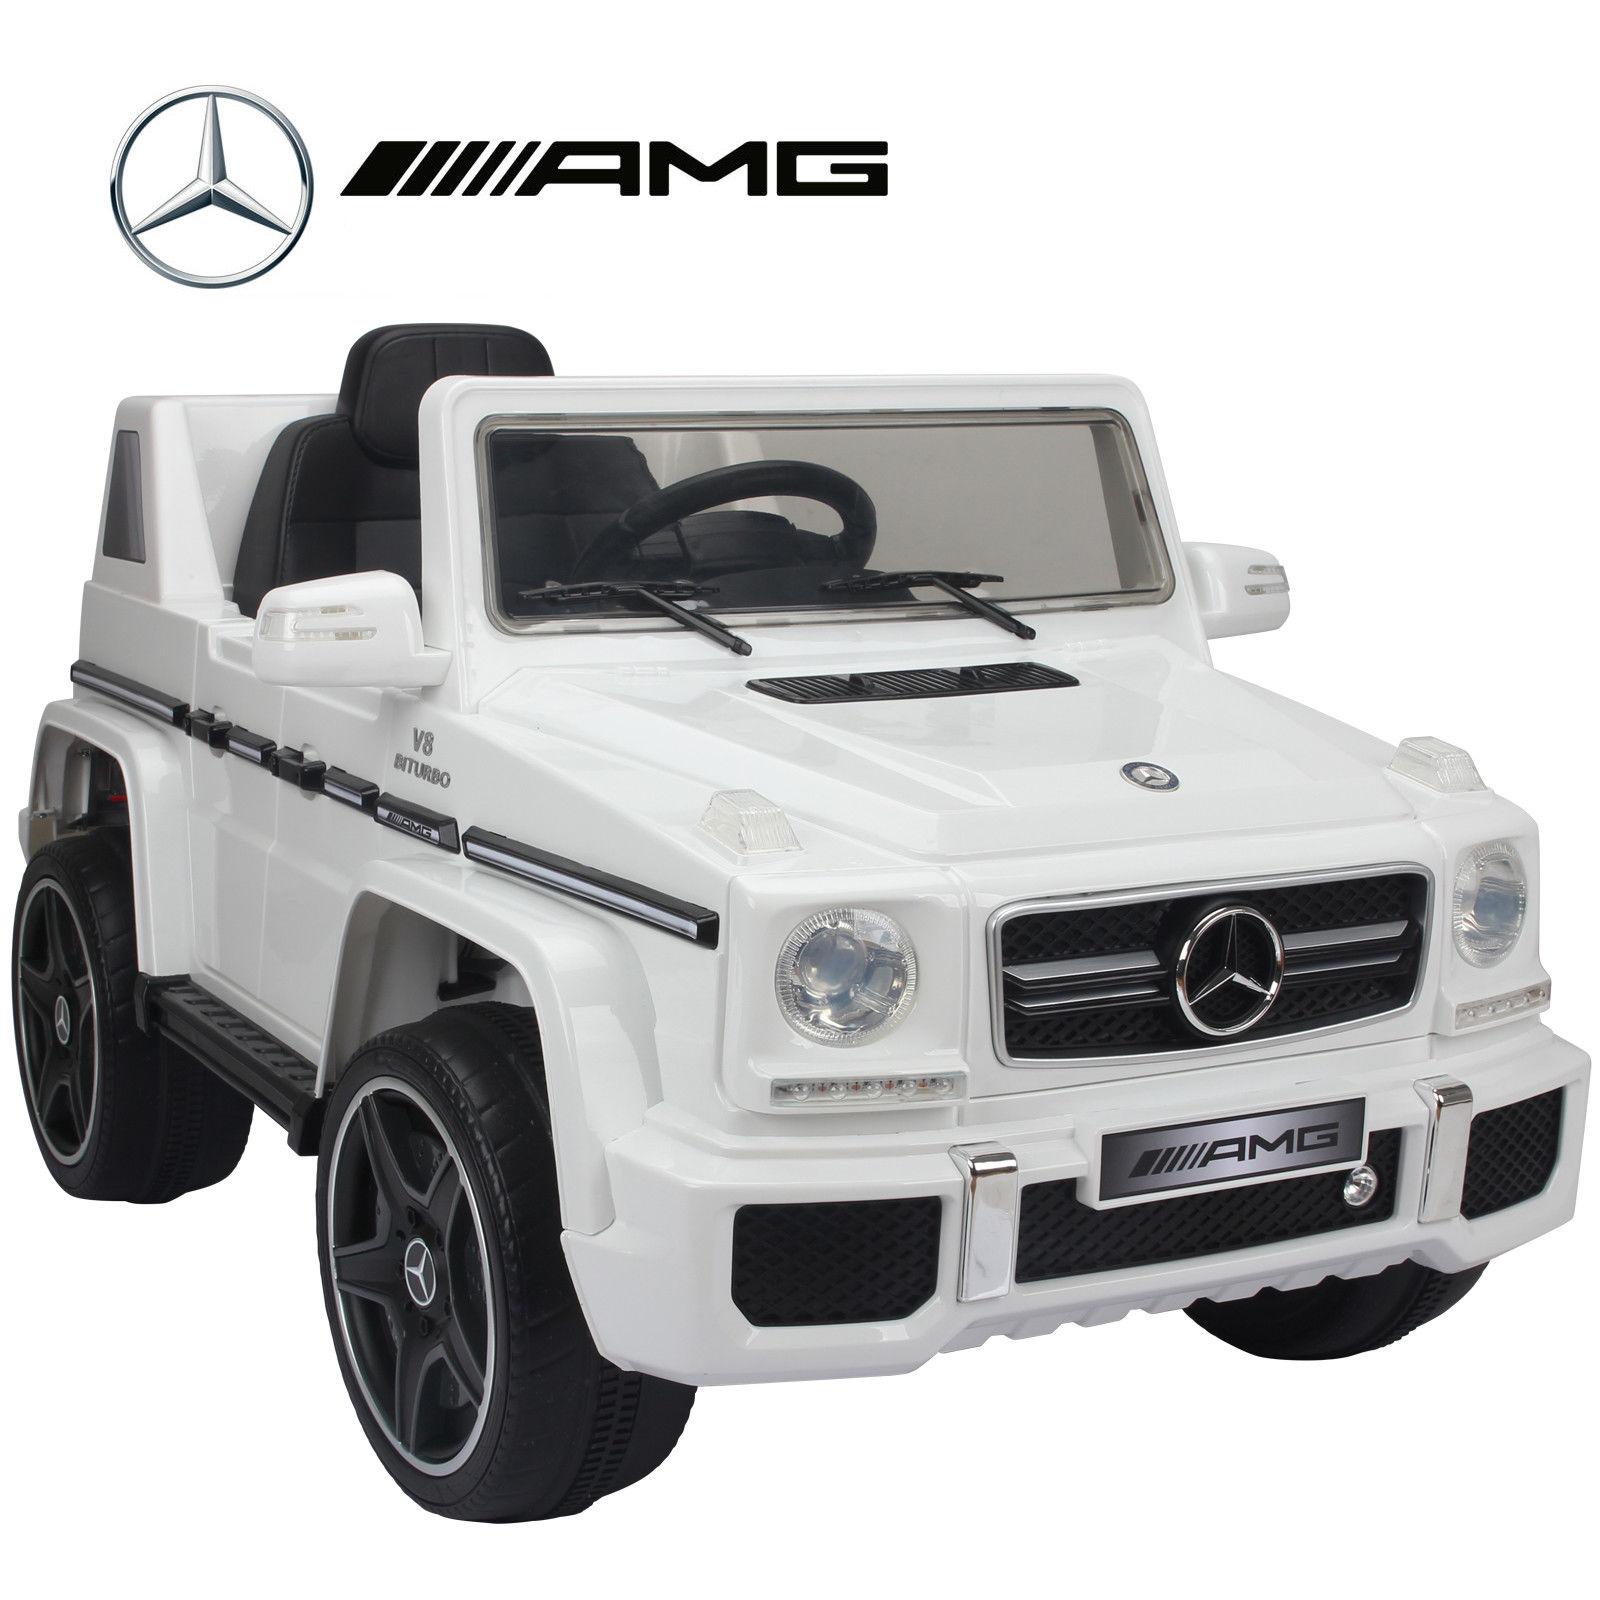 Mercedes Benz G63 Used: KIDS RIDE ON CAR MERCEDES BENZ G63 12V REMOTE CONTROL CAR